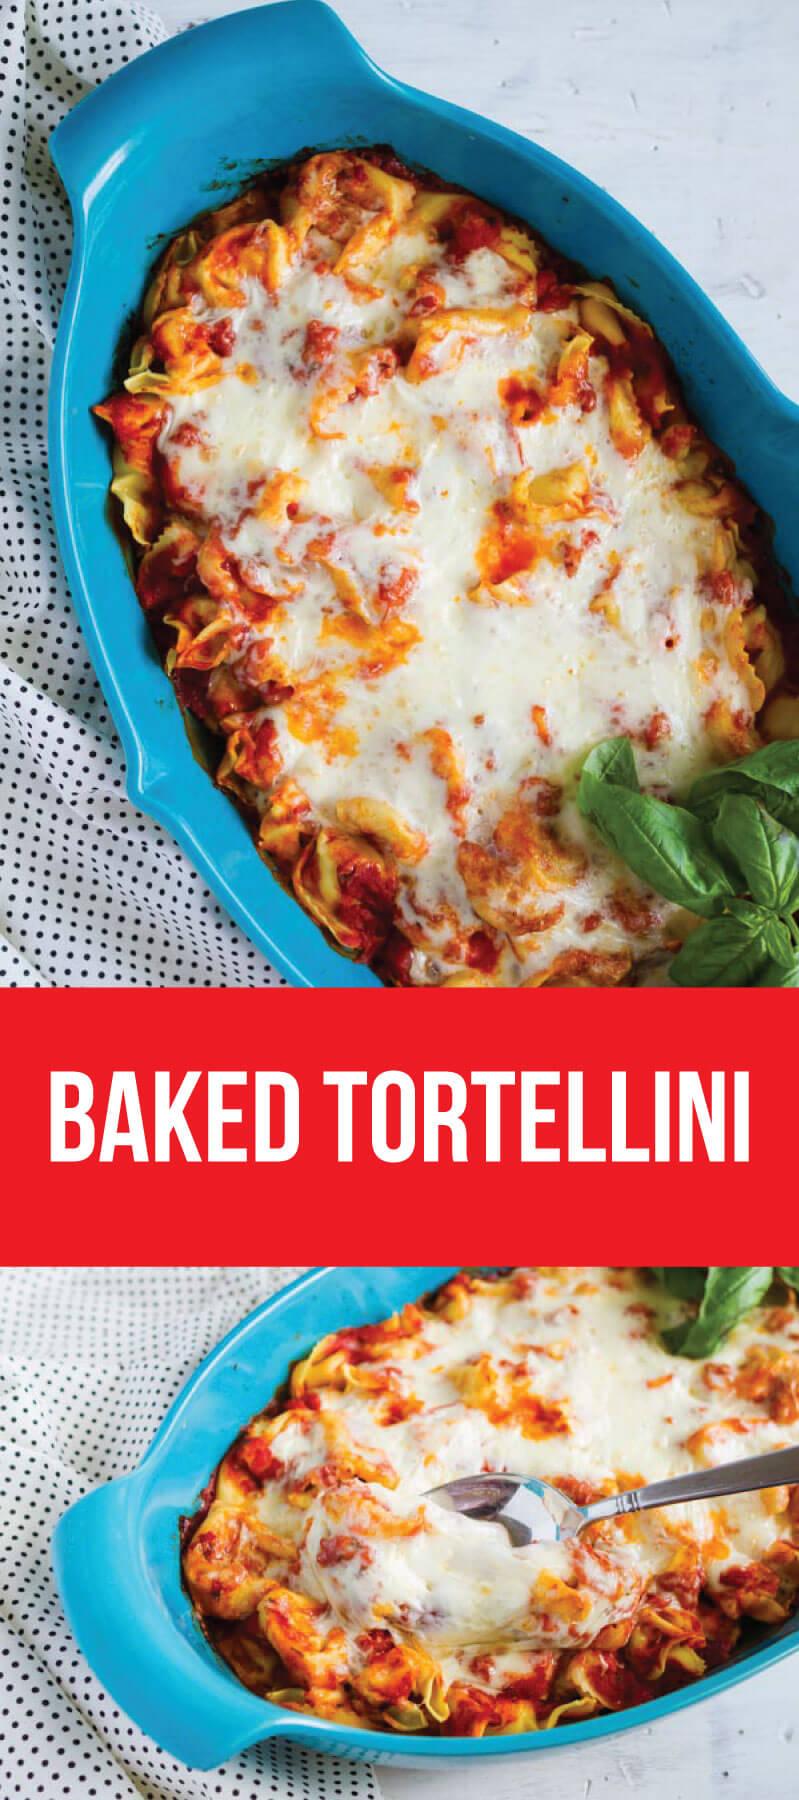 Super simple but tasty Baked Tortellini - if your family likes pasta, they will love this ooey gooey main dish! via www.thirtyhandmadedays.com